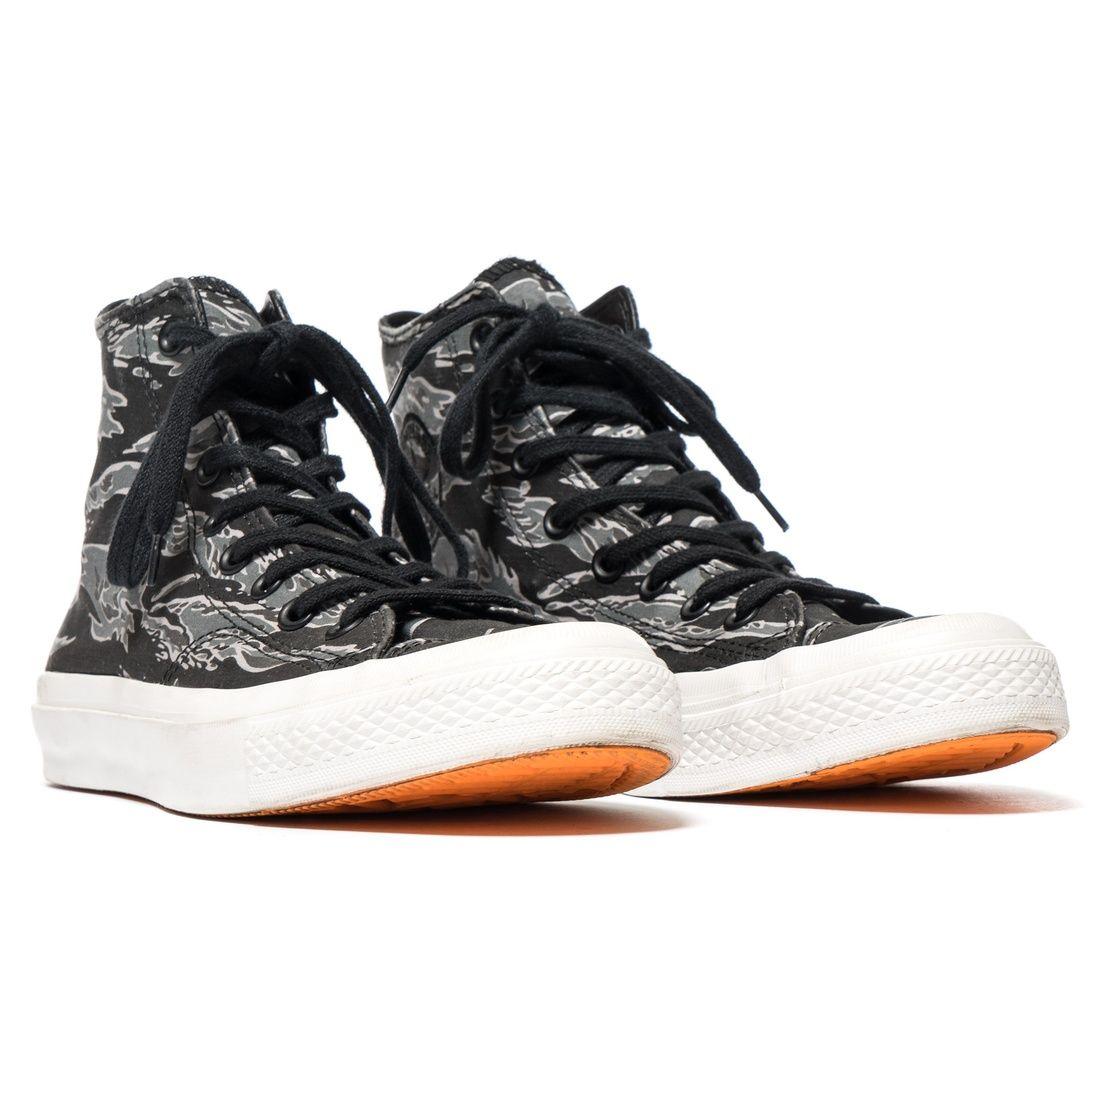 b8a6a0fbd80d19 Converse Kicks Hi X Converse First String Chuck Taylor Hi  Tiger Camo   Black Size 9.5  84 - Grailed